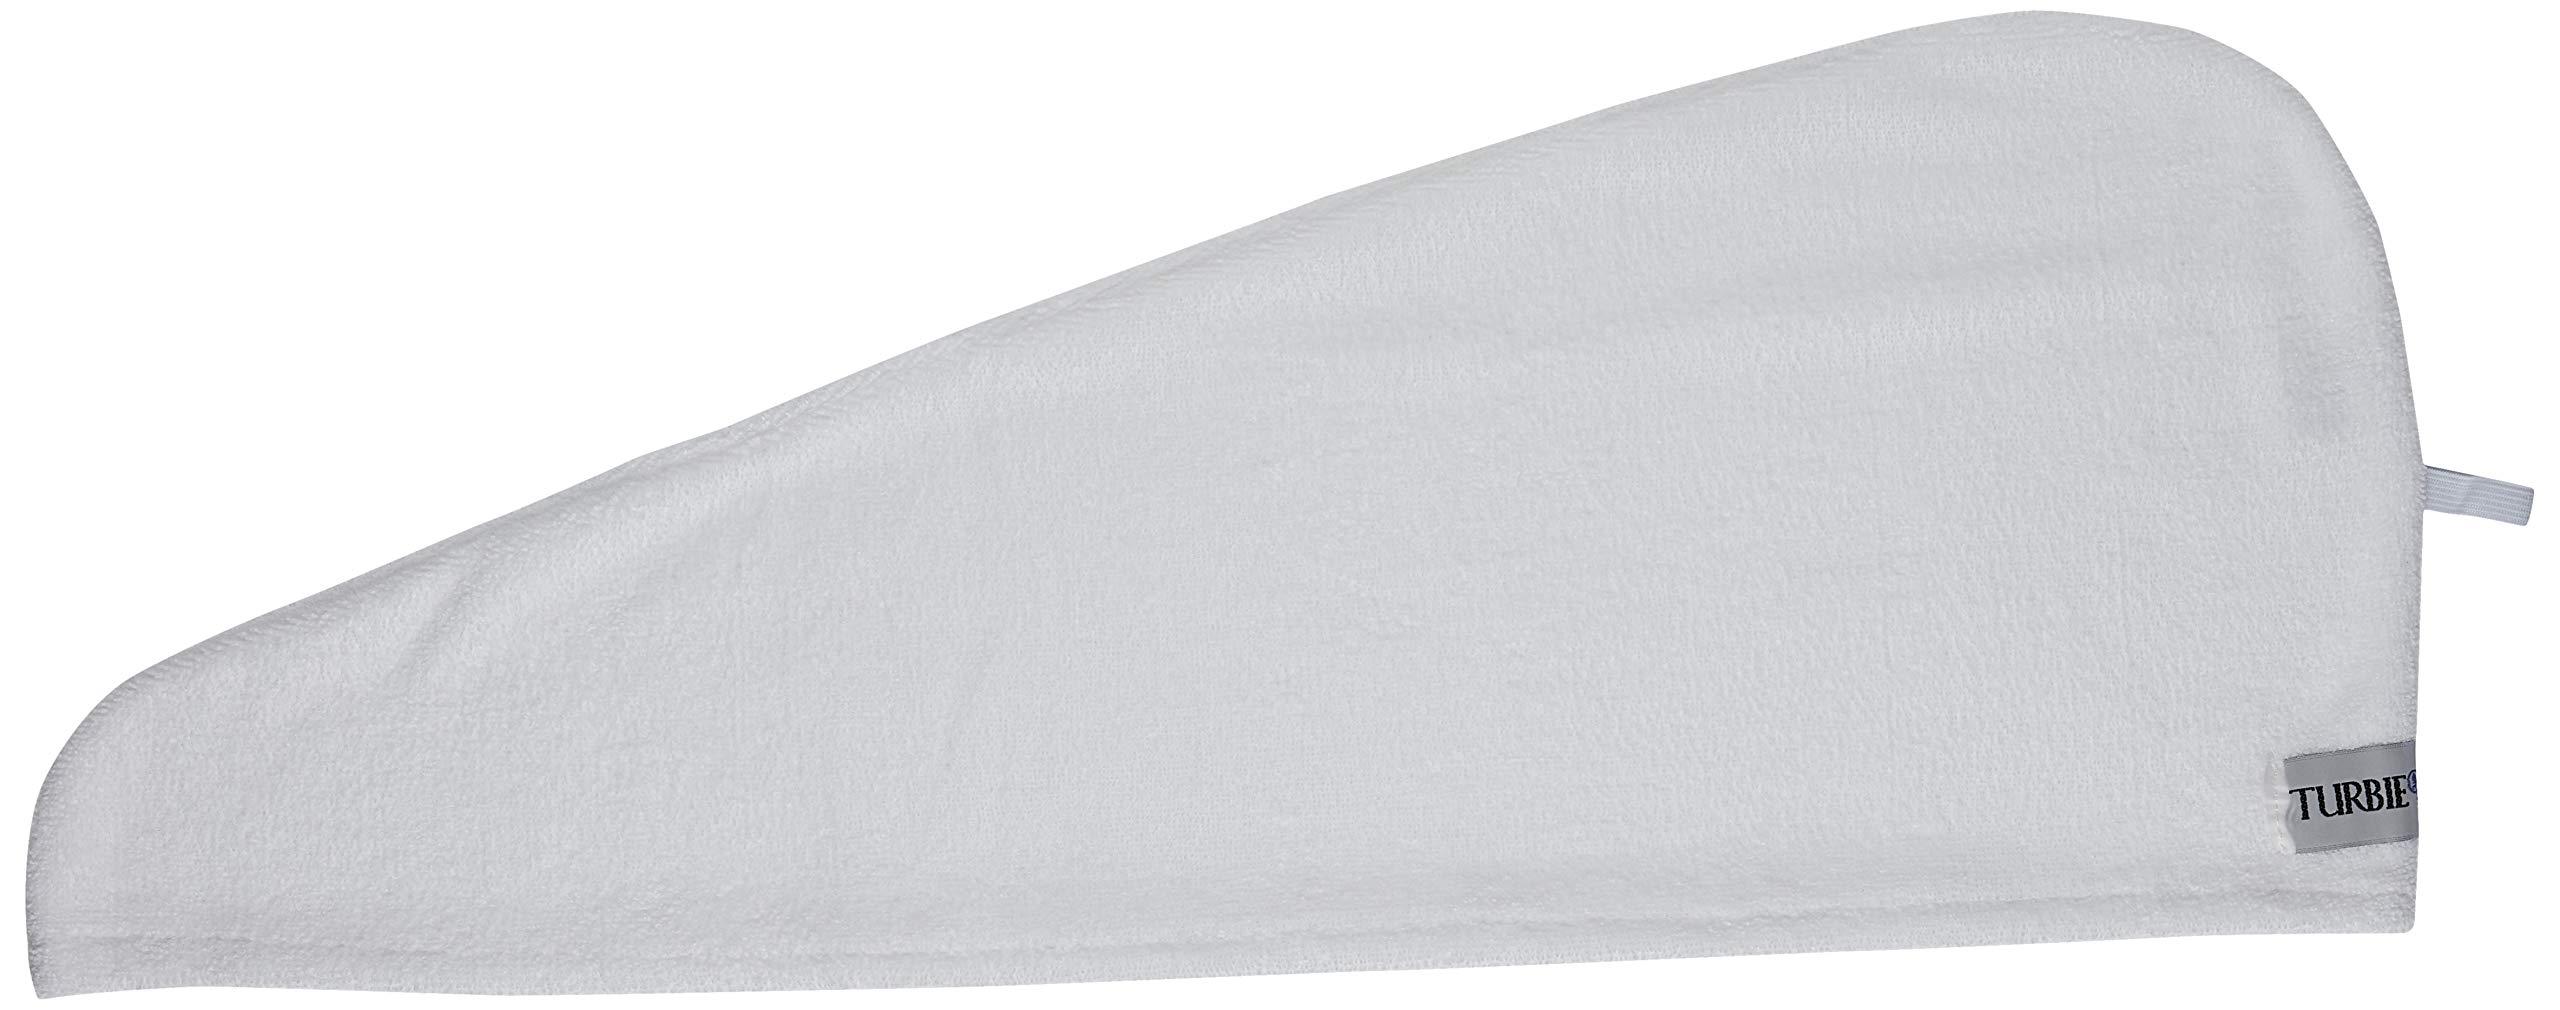 Turbie Twist Microfiber Hair Towel 2